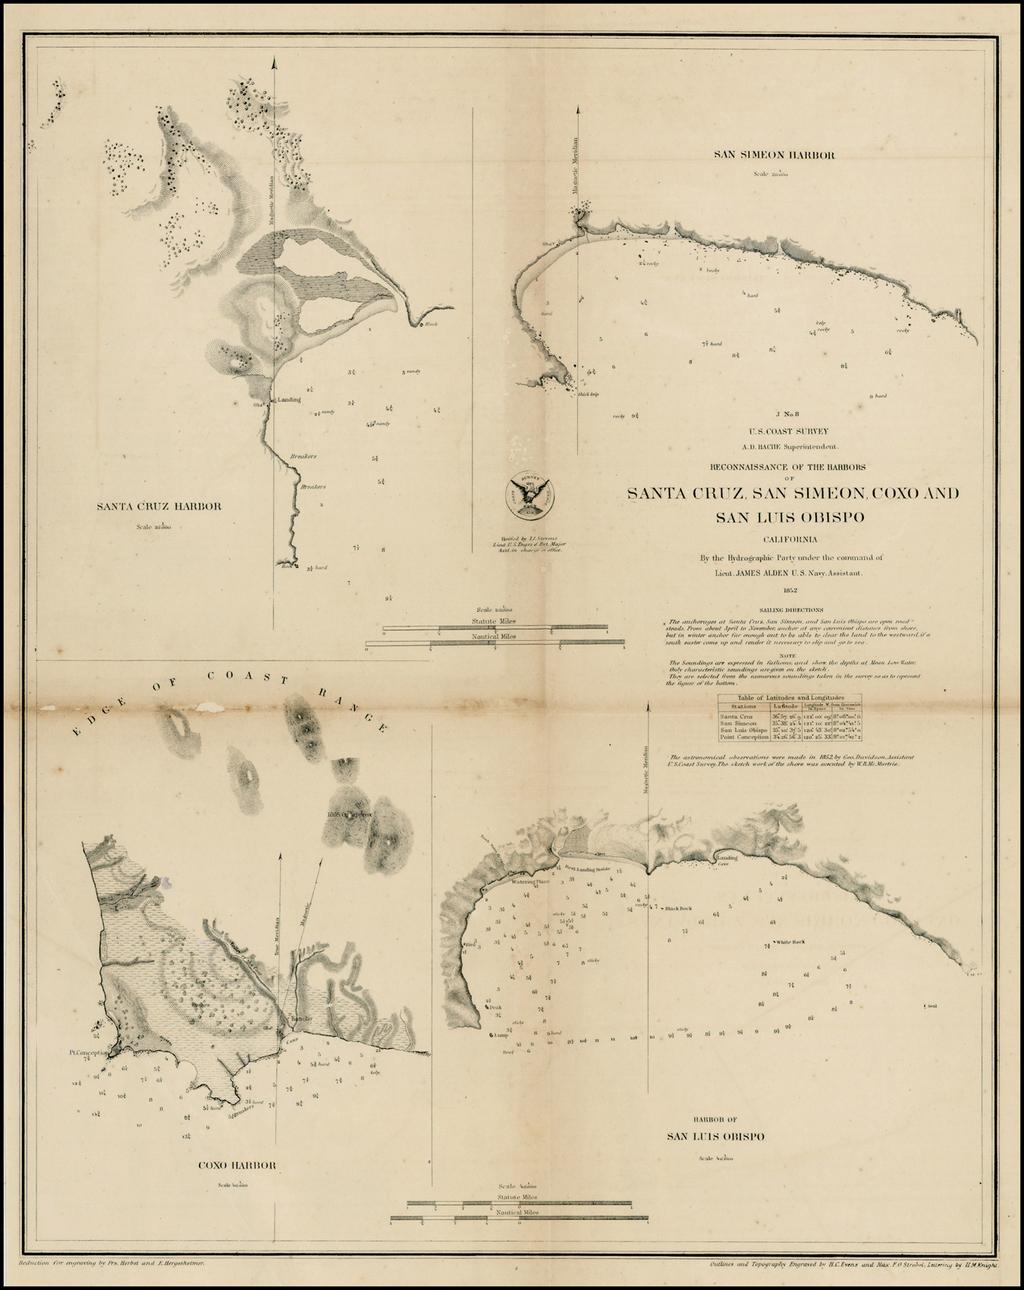 Santa Cruz Harbor [and] San Simeon Harbor [and] Coxo Harbor [and] Harbor of San Luis Obispo By United States Coast Survey